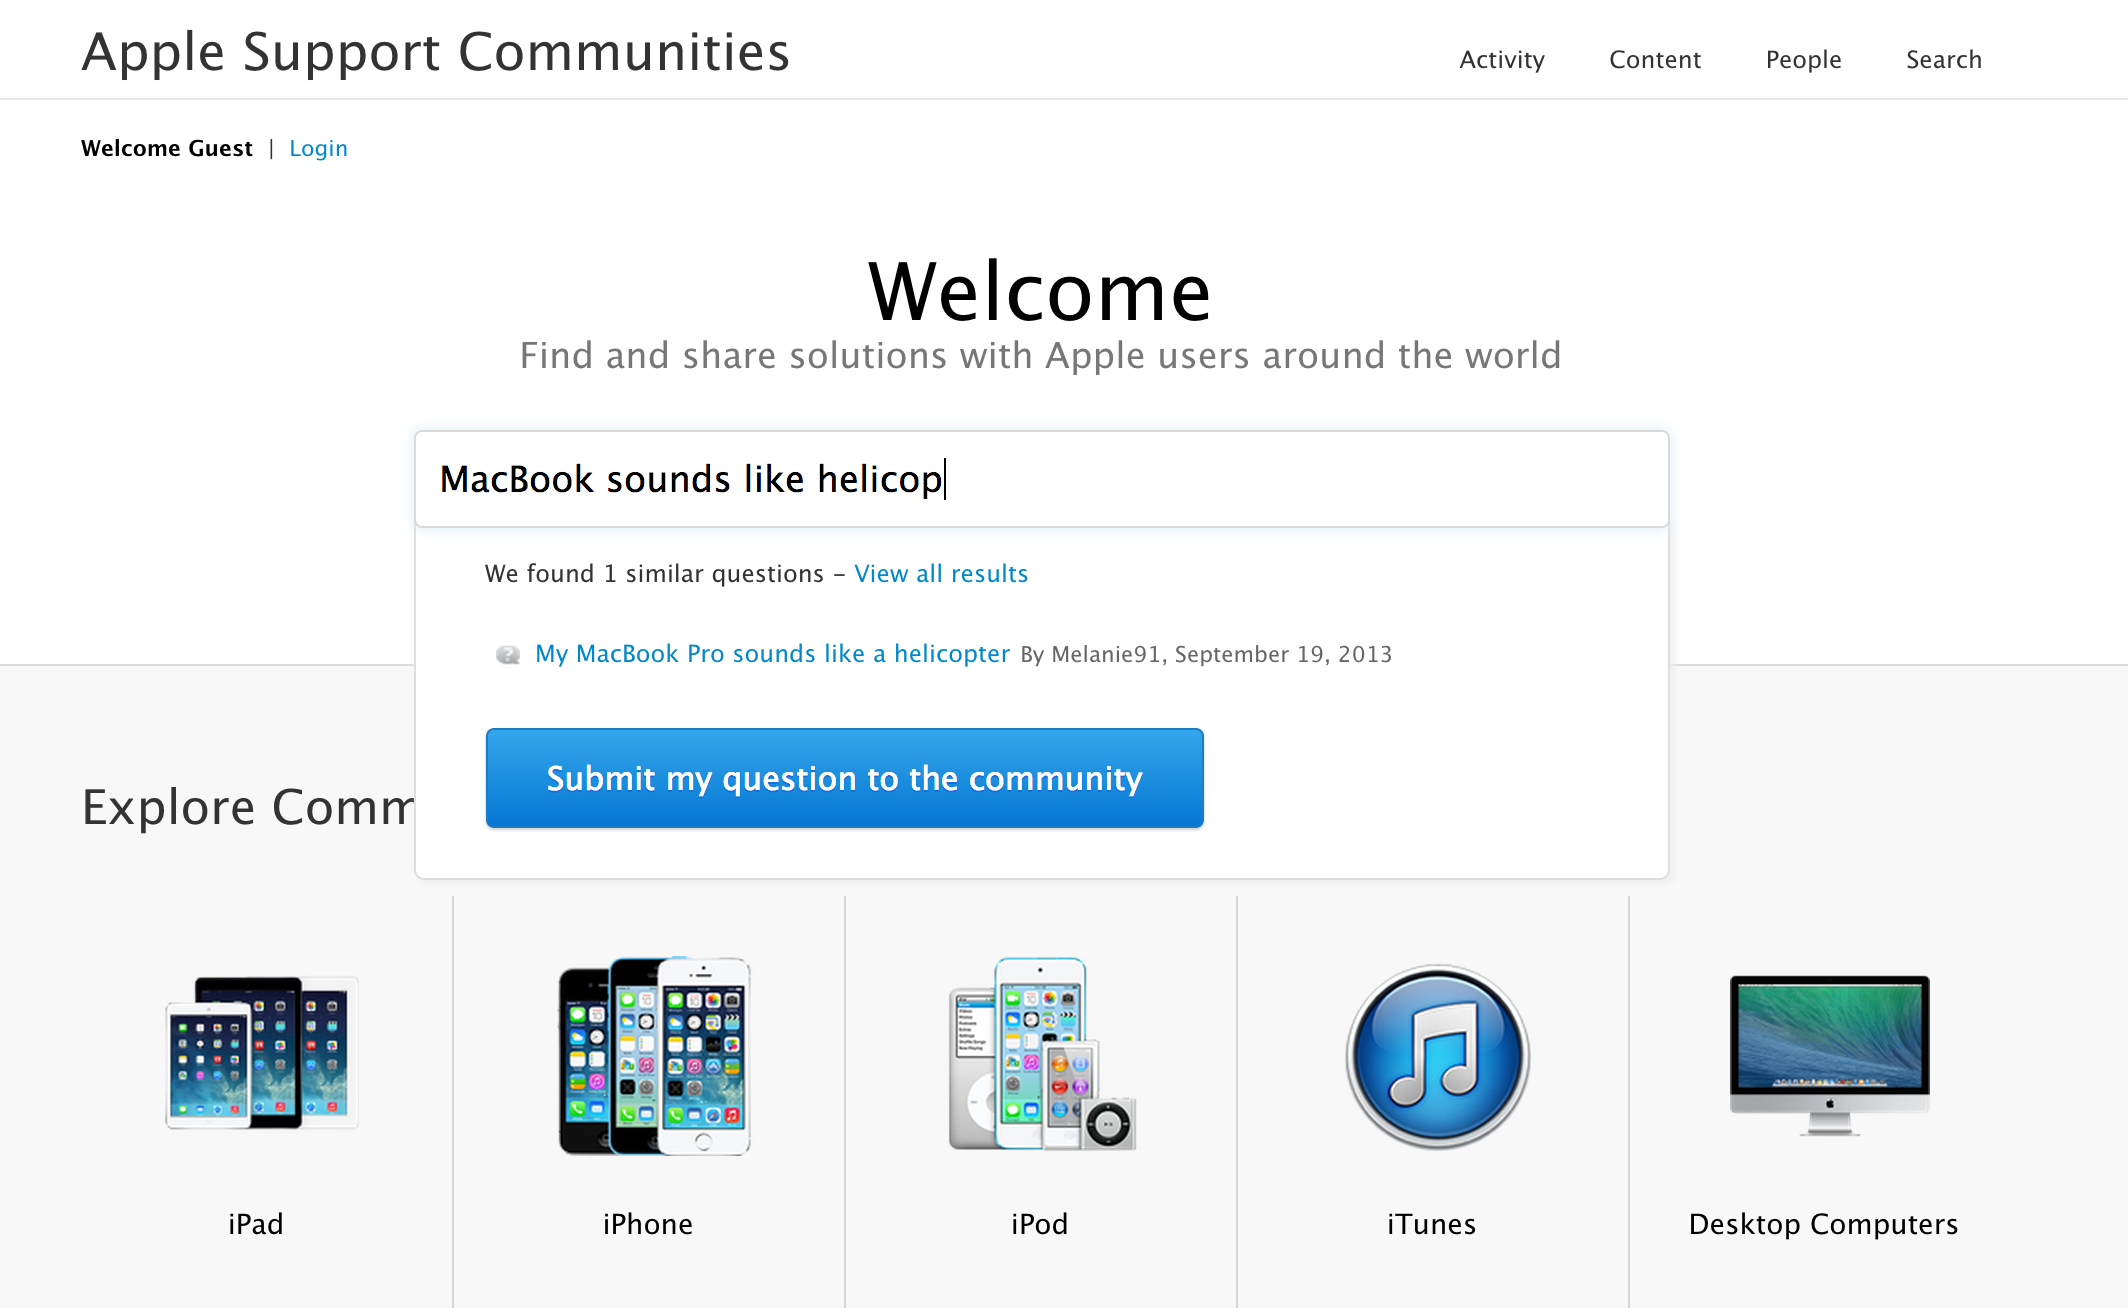 Apple-Support-Communities-04